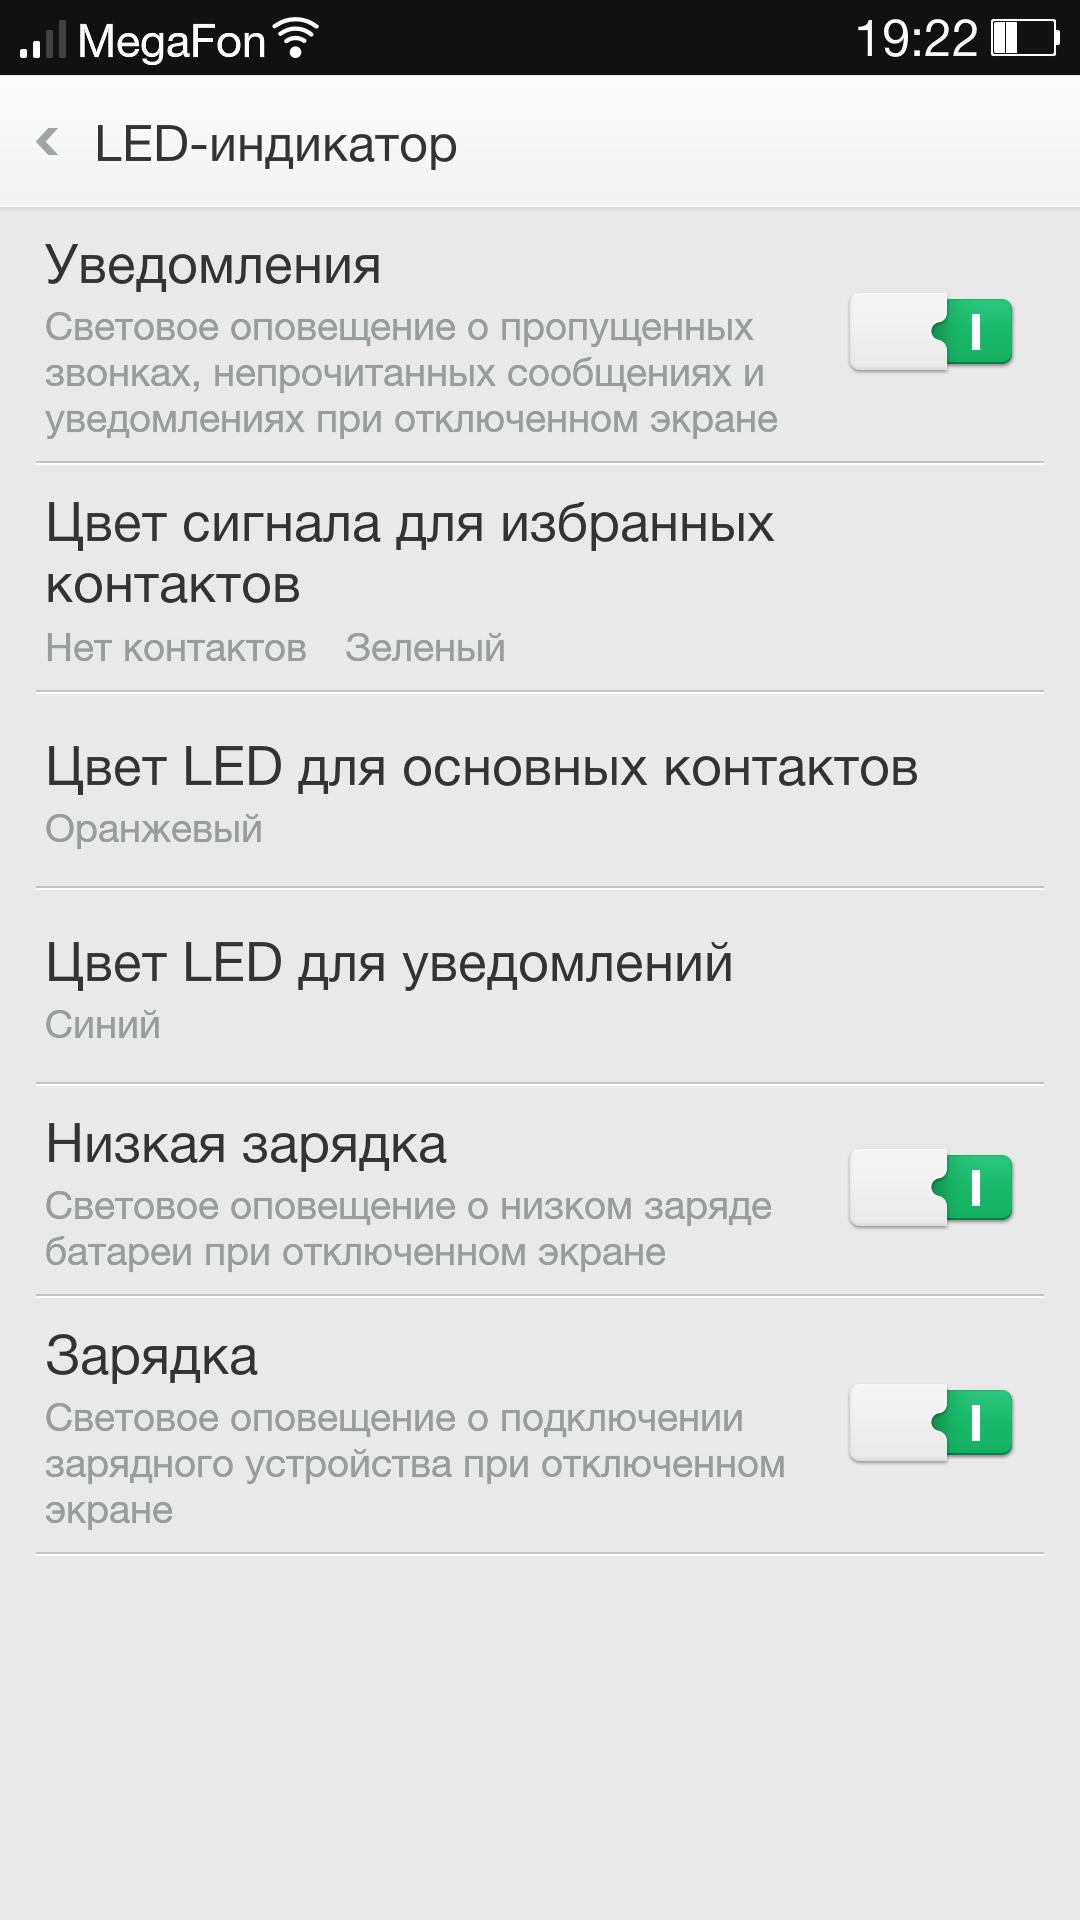 Screenshot_2013-10-26-19-22-14